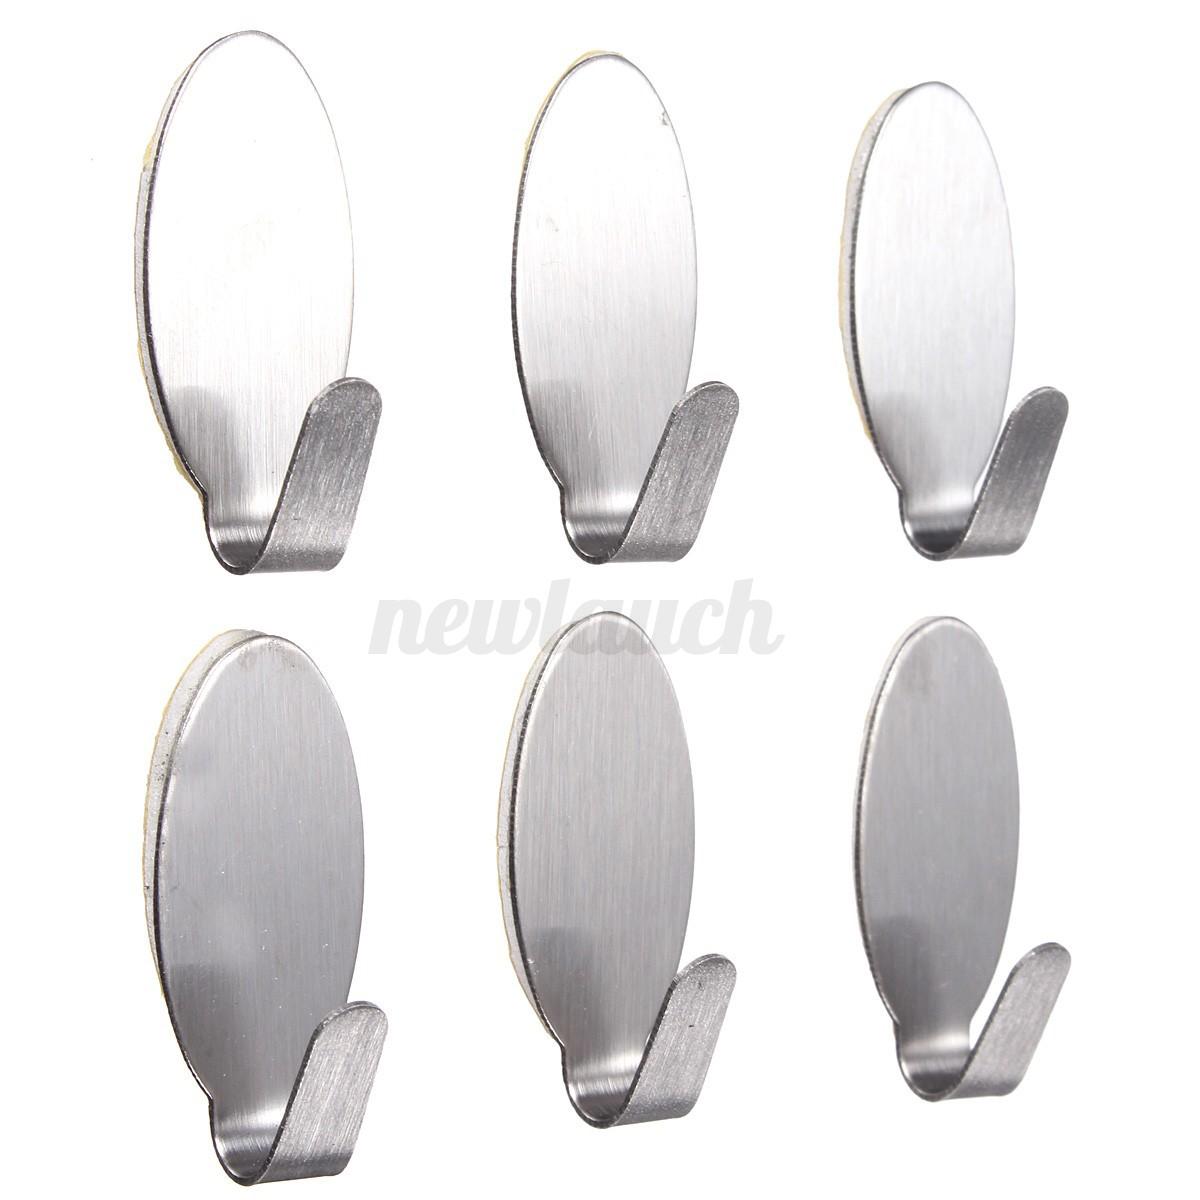 12 x adhesive stainless steel towel racks wall door hooks for Bathroom hooks